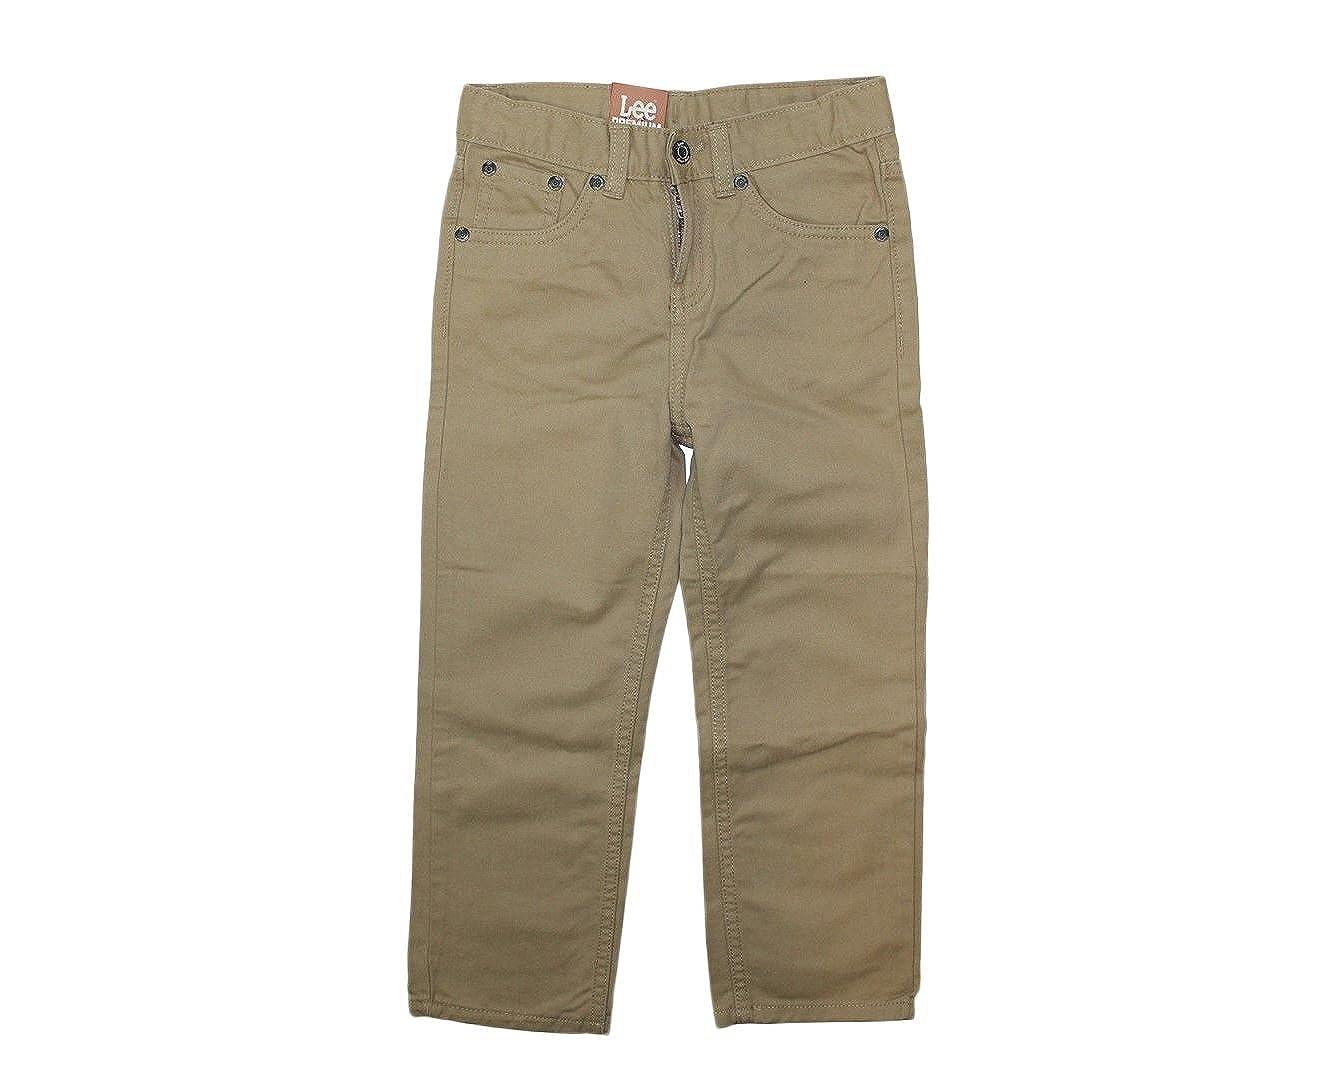 Lee Boys Premium Select Regular Fit Straight Leg Jeans